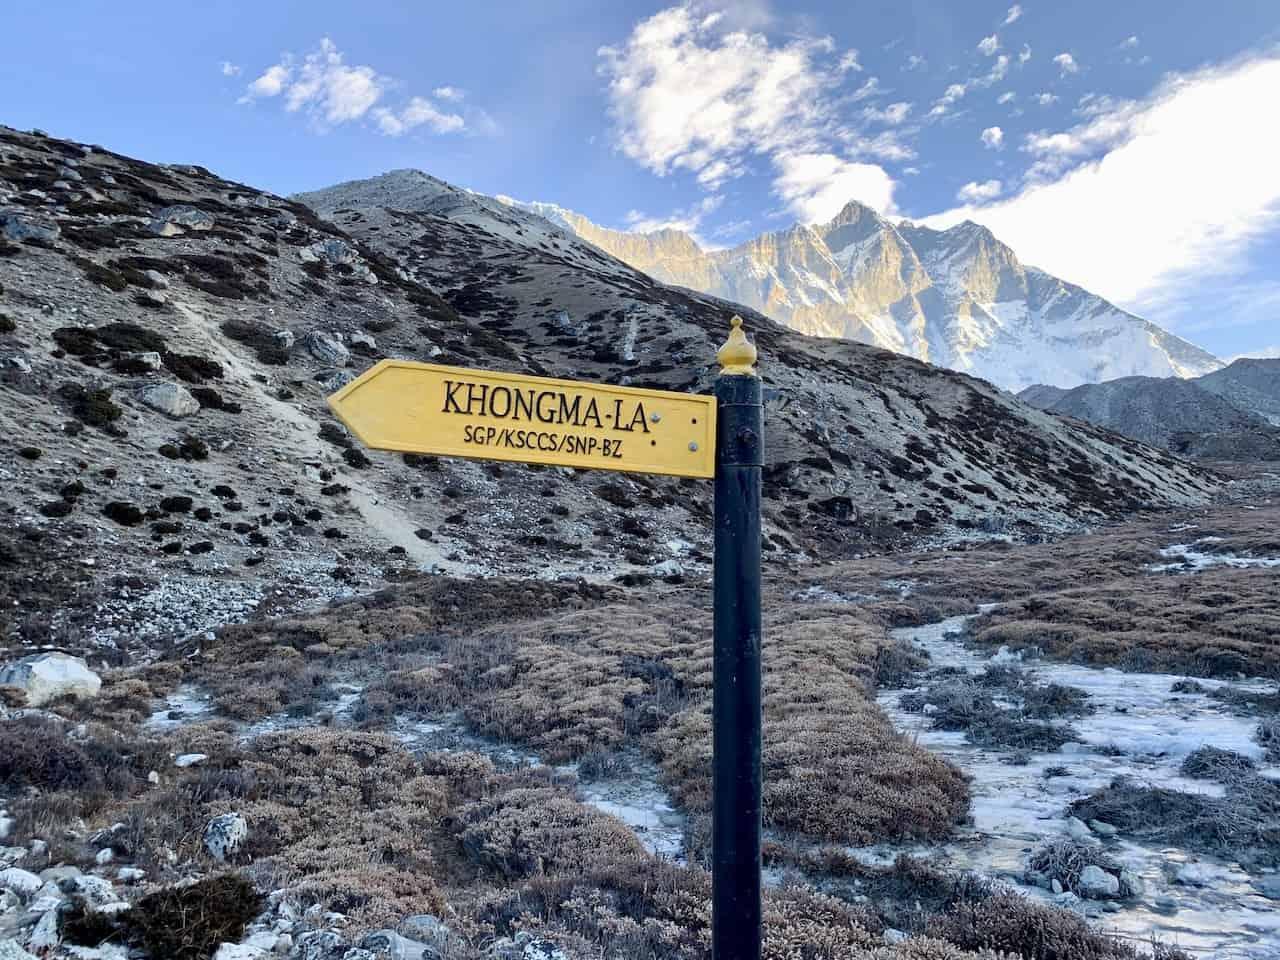 Kongma La Pass Directions